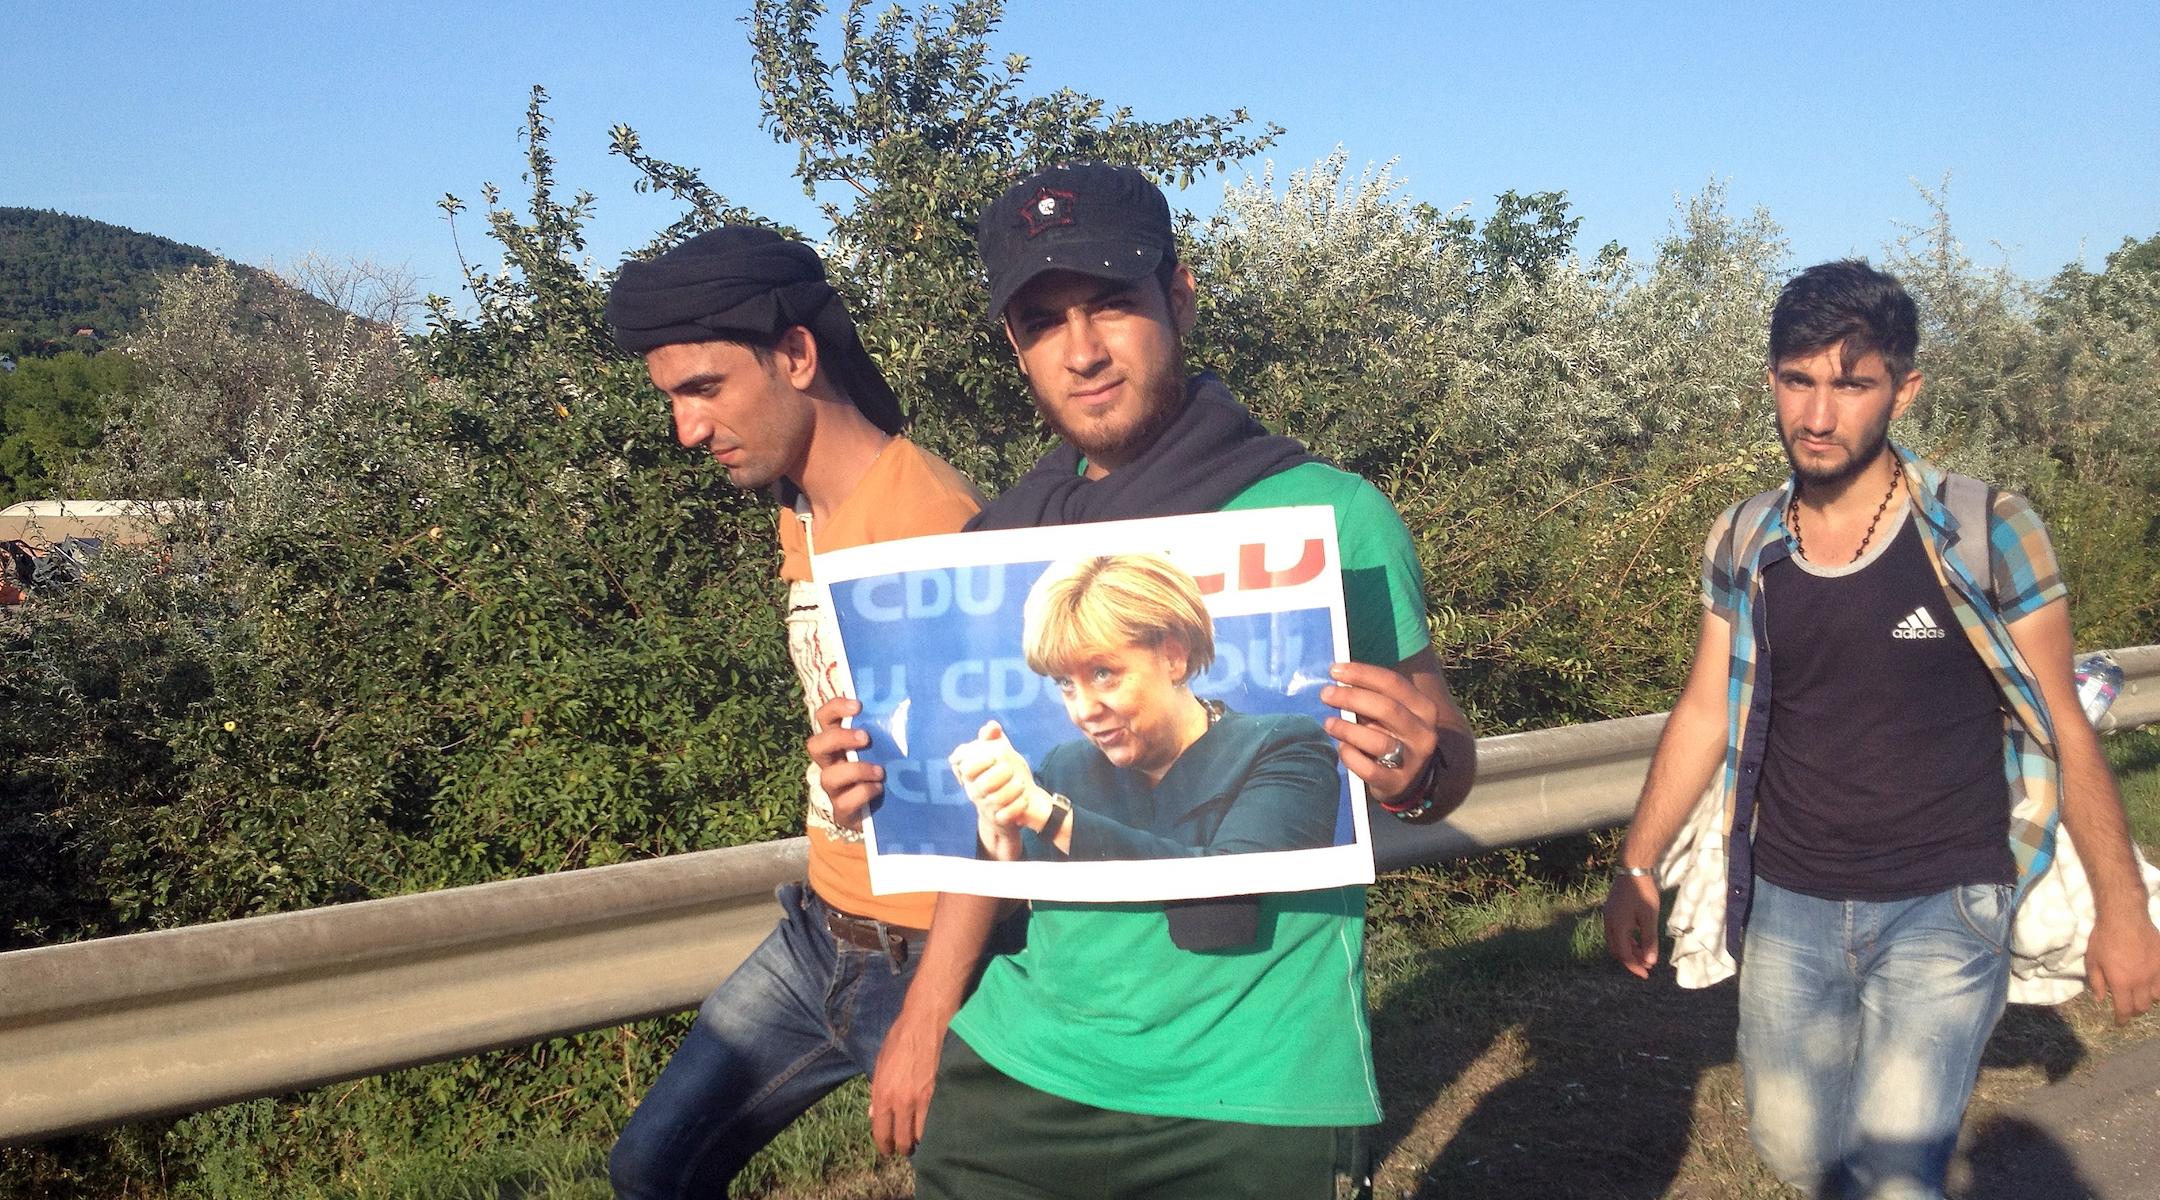 Syrian refugees carry a photograph of Angela Merkel